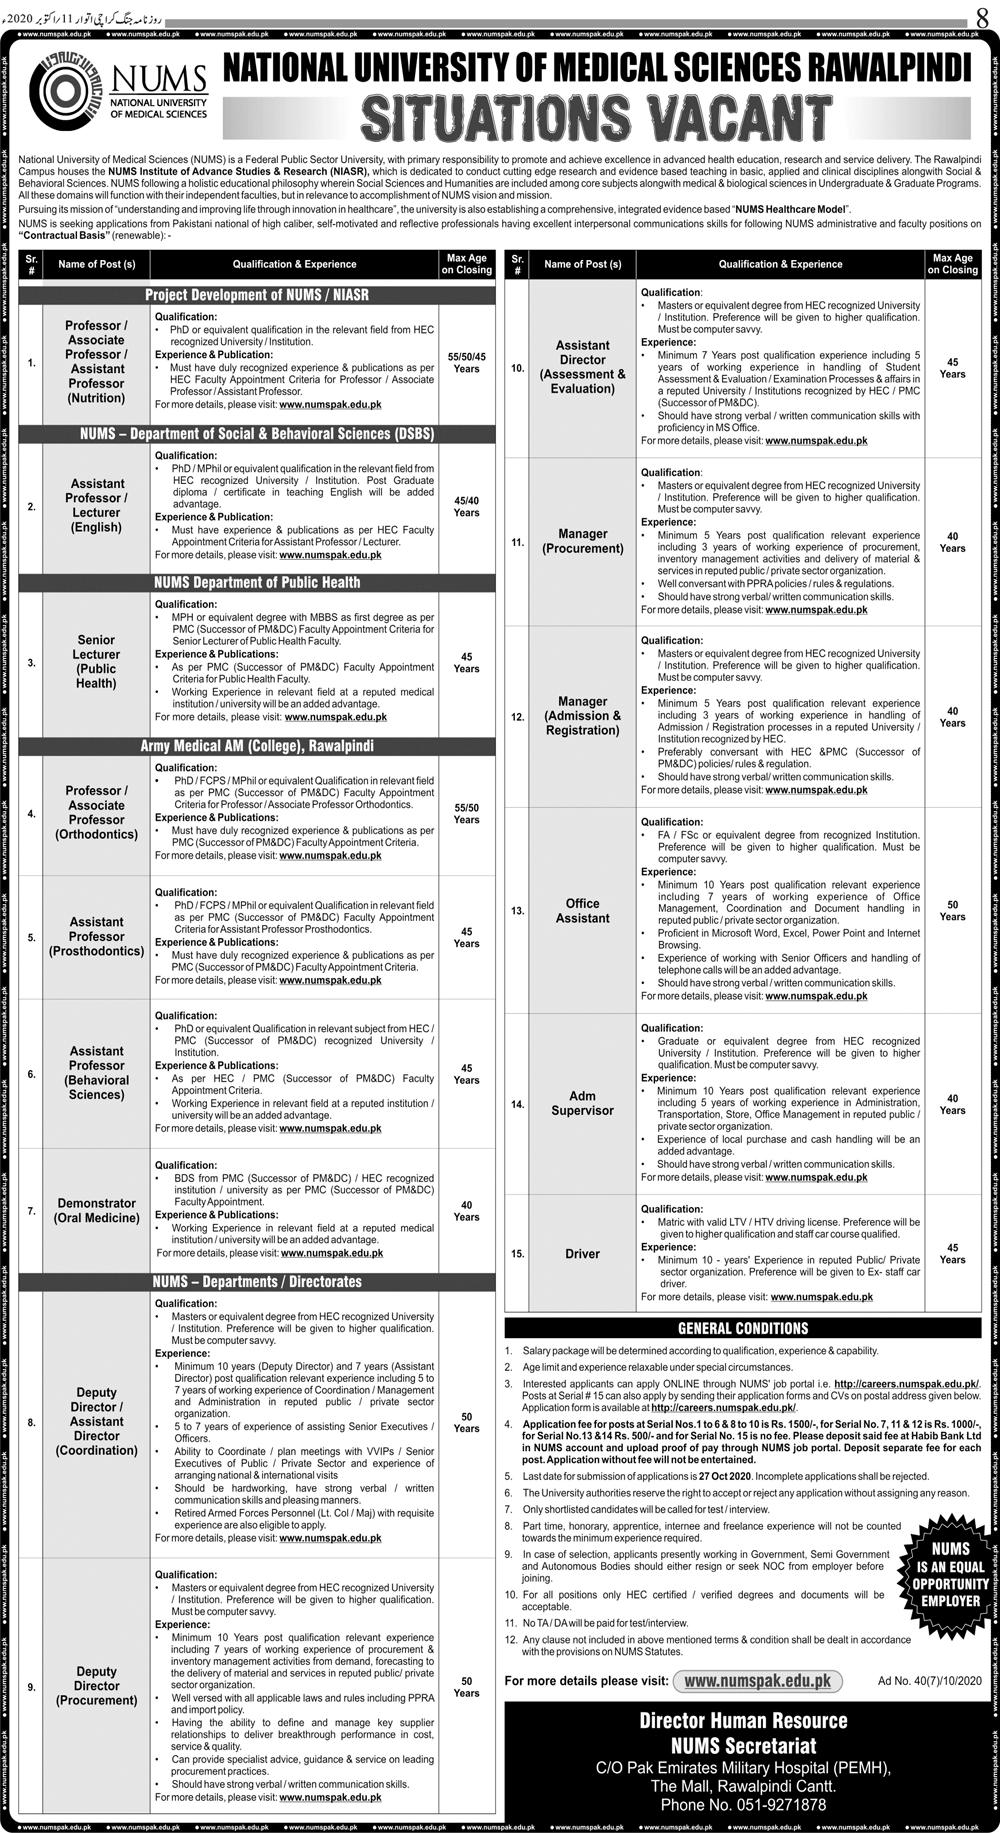 National University of Medical Sciences Rawalpindi Jobs 2020